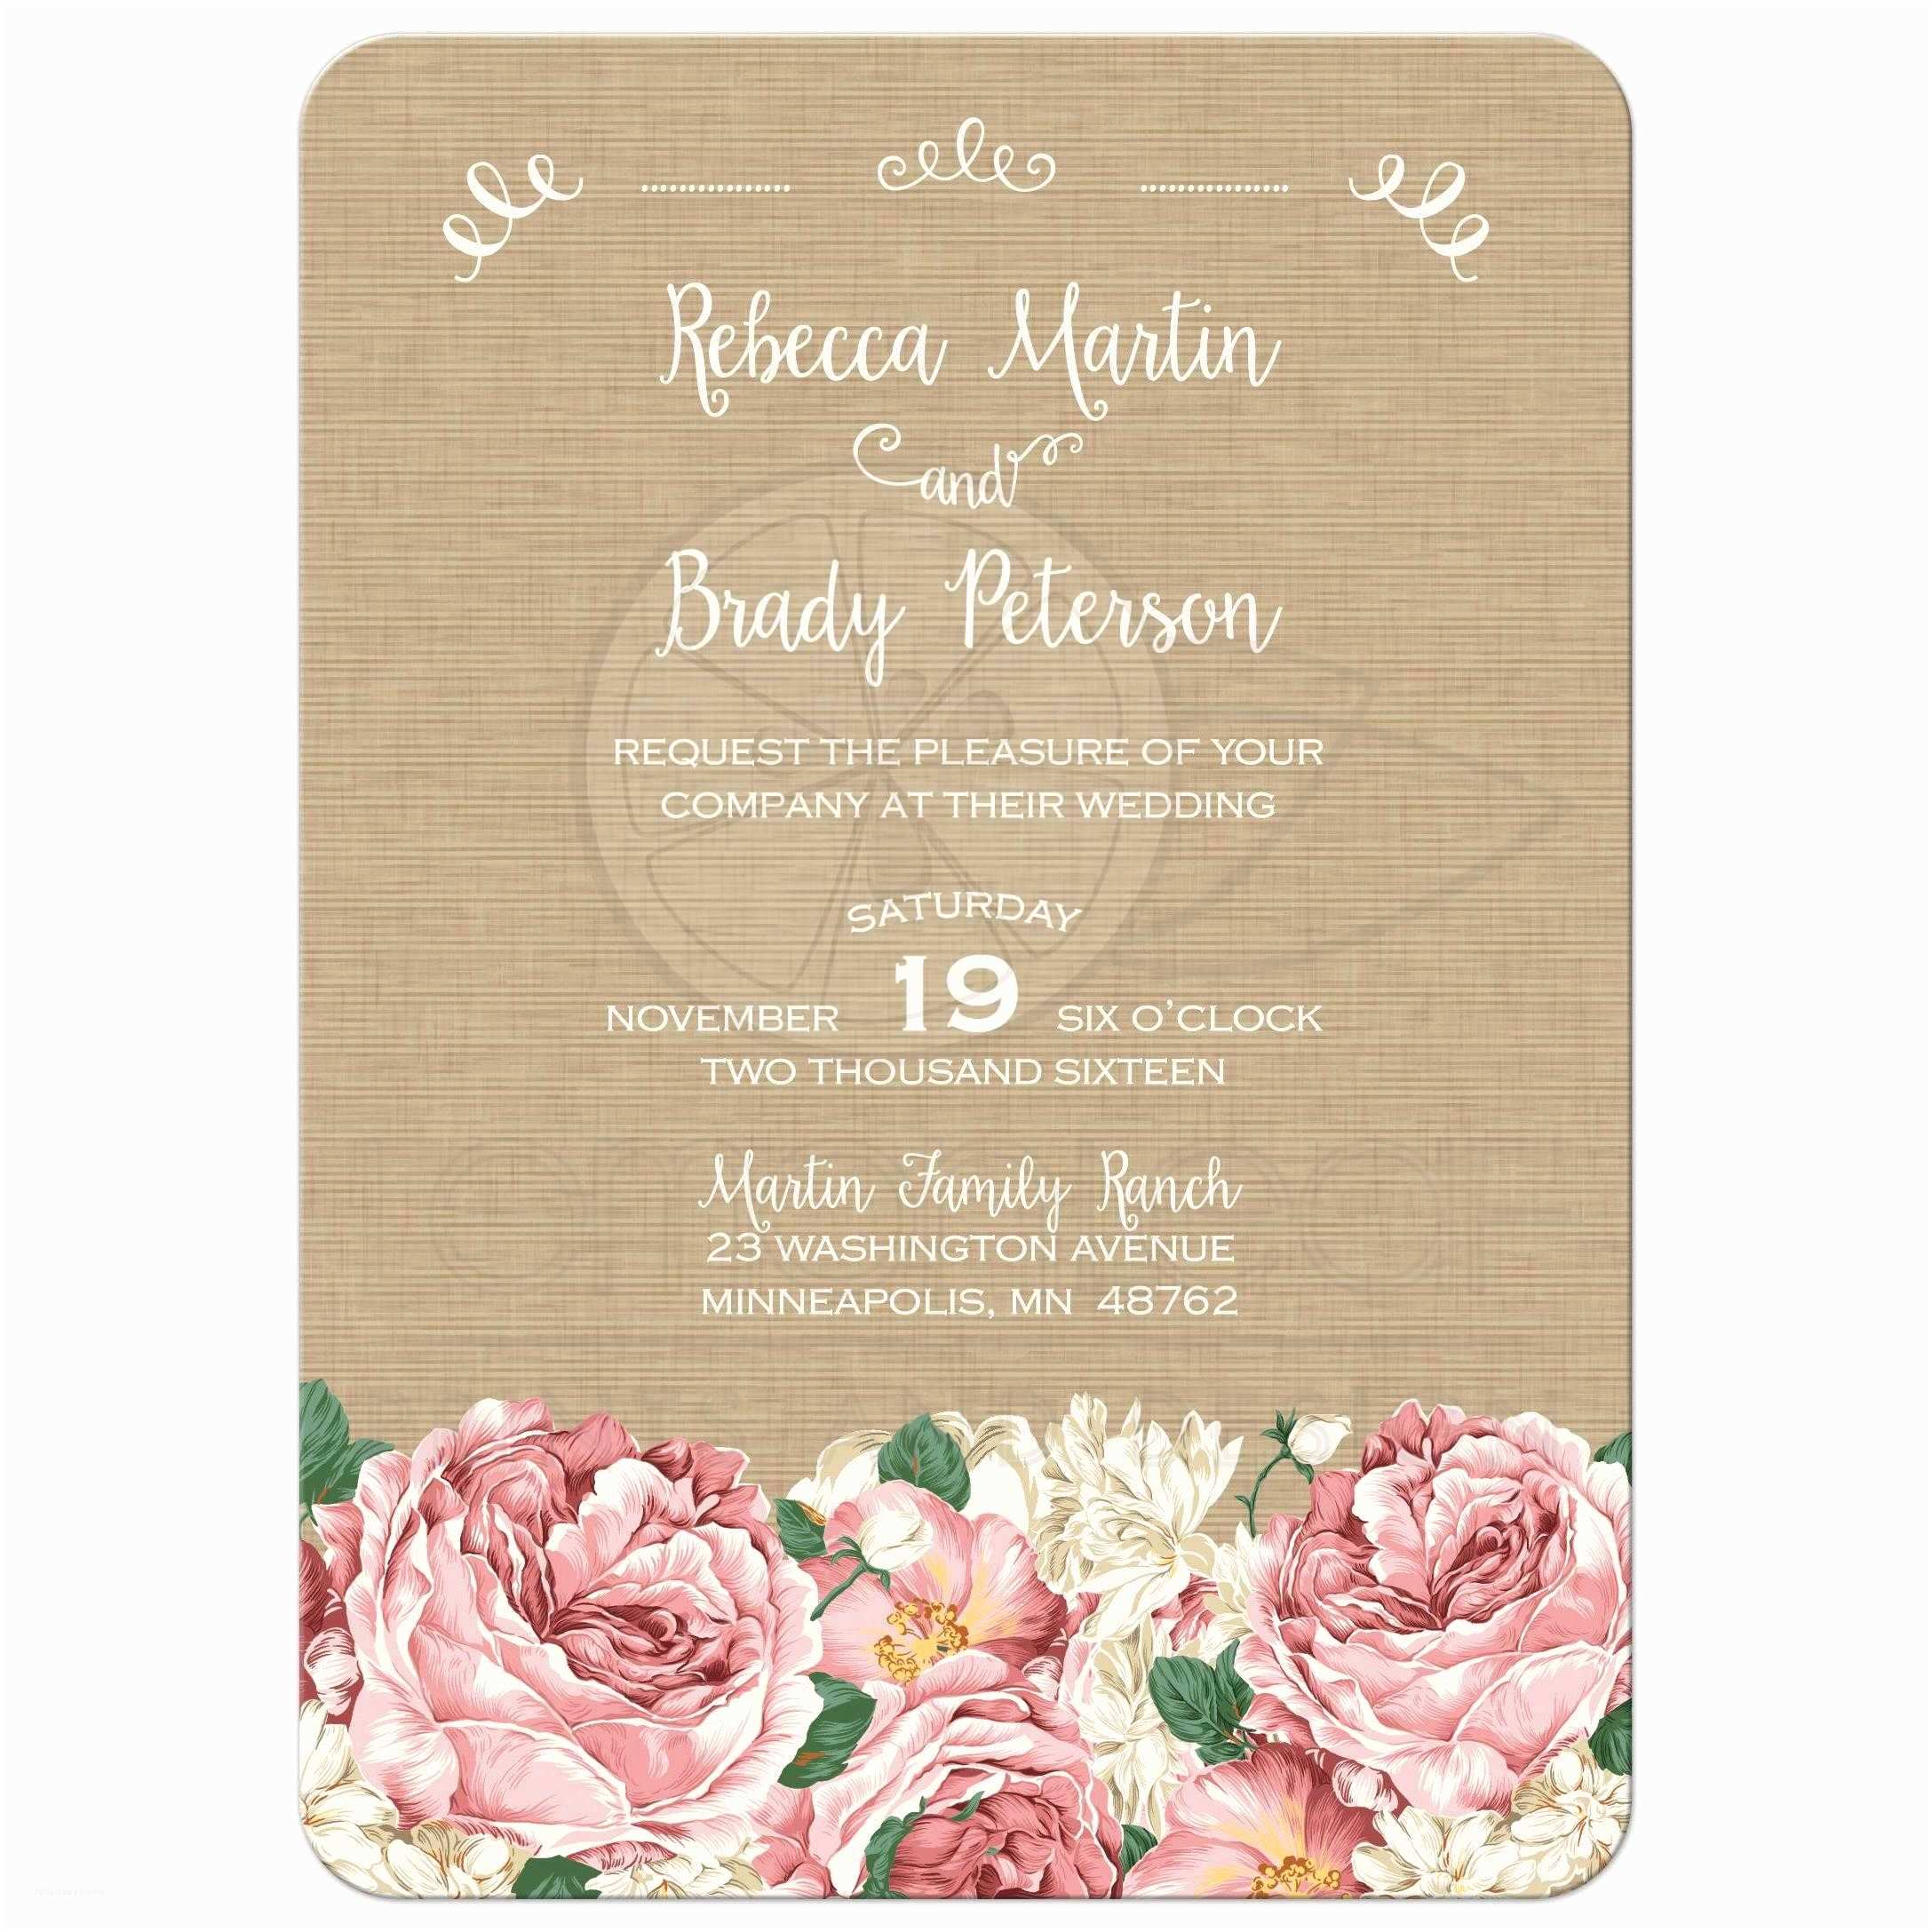 Pink Peony Wedding Invitations Wedding Invitation Rustic Pink Peony Flowers On Canvas